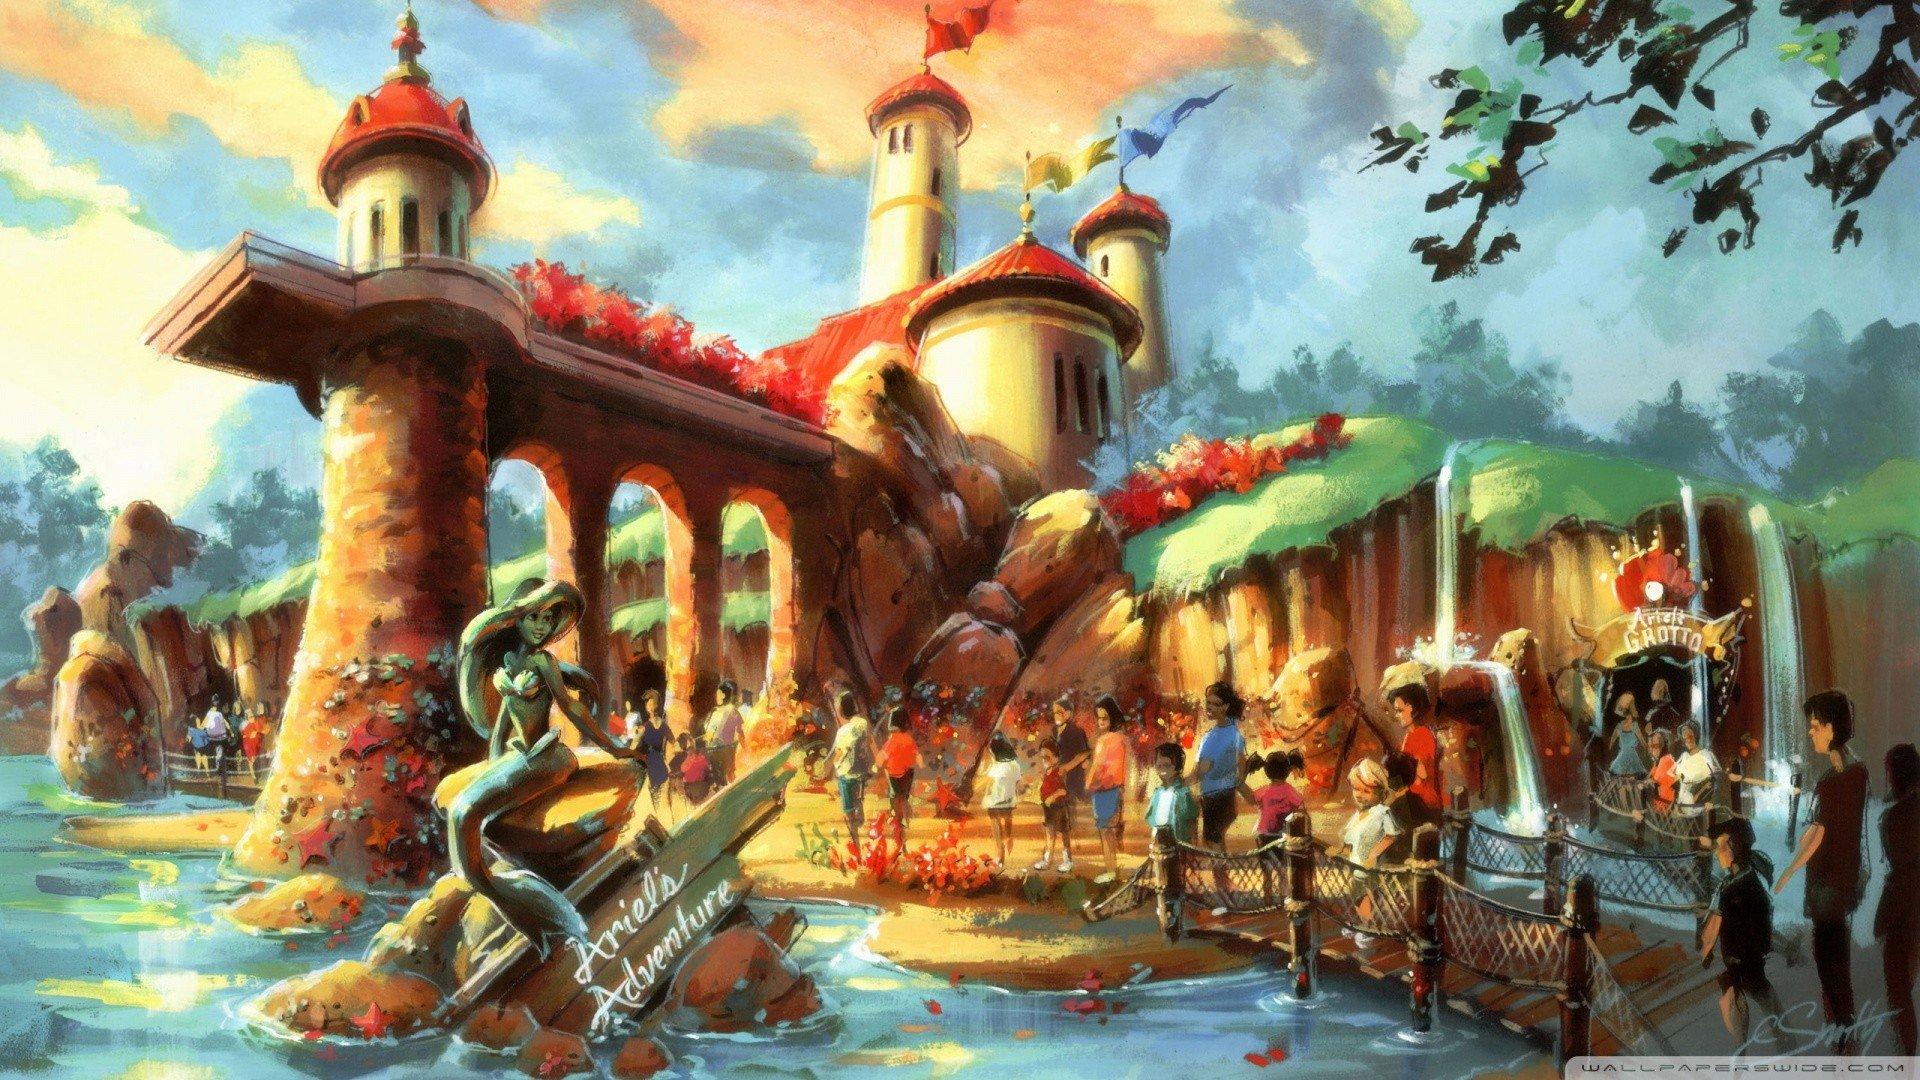 Disney Concept Art Wallpaper Wallpapersafari